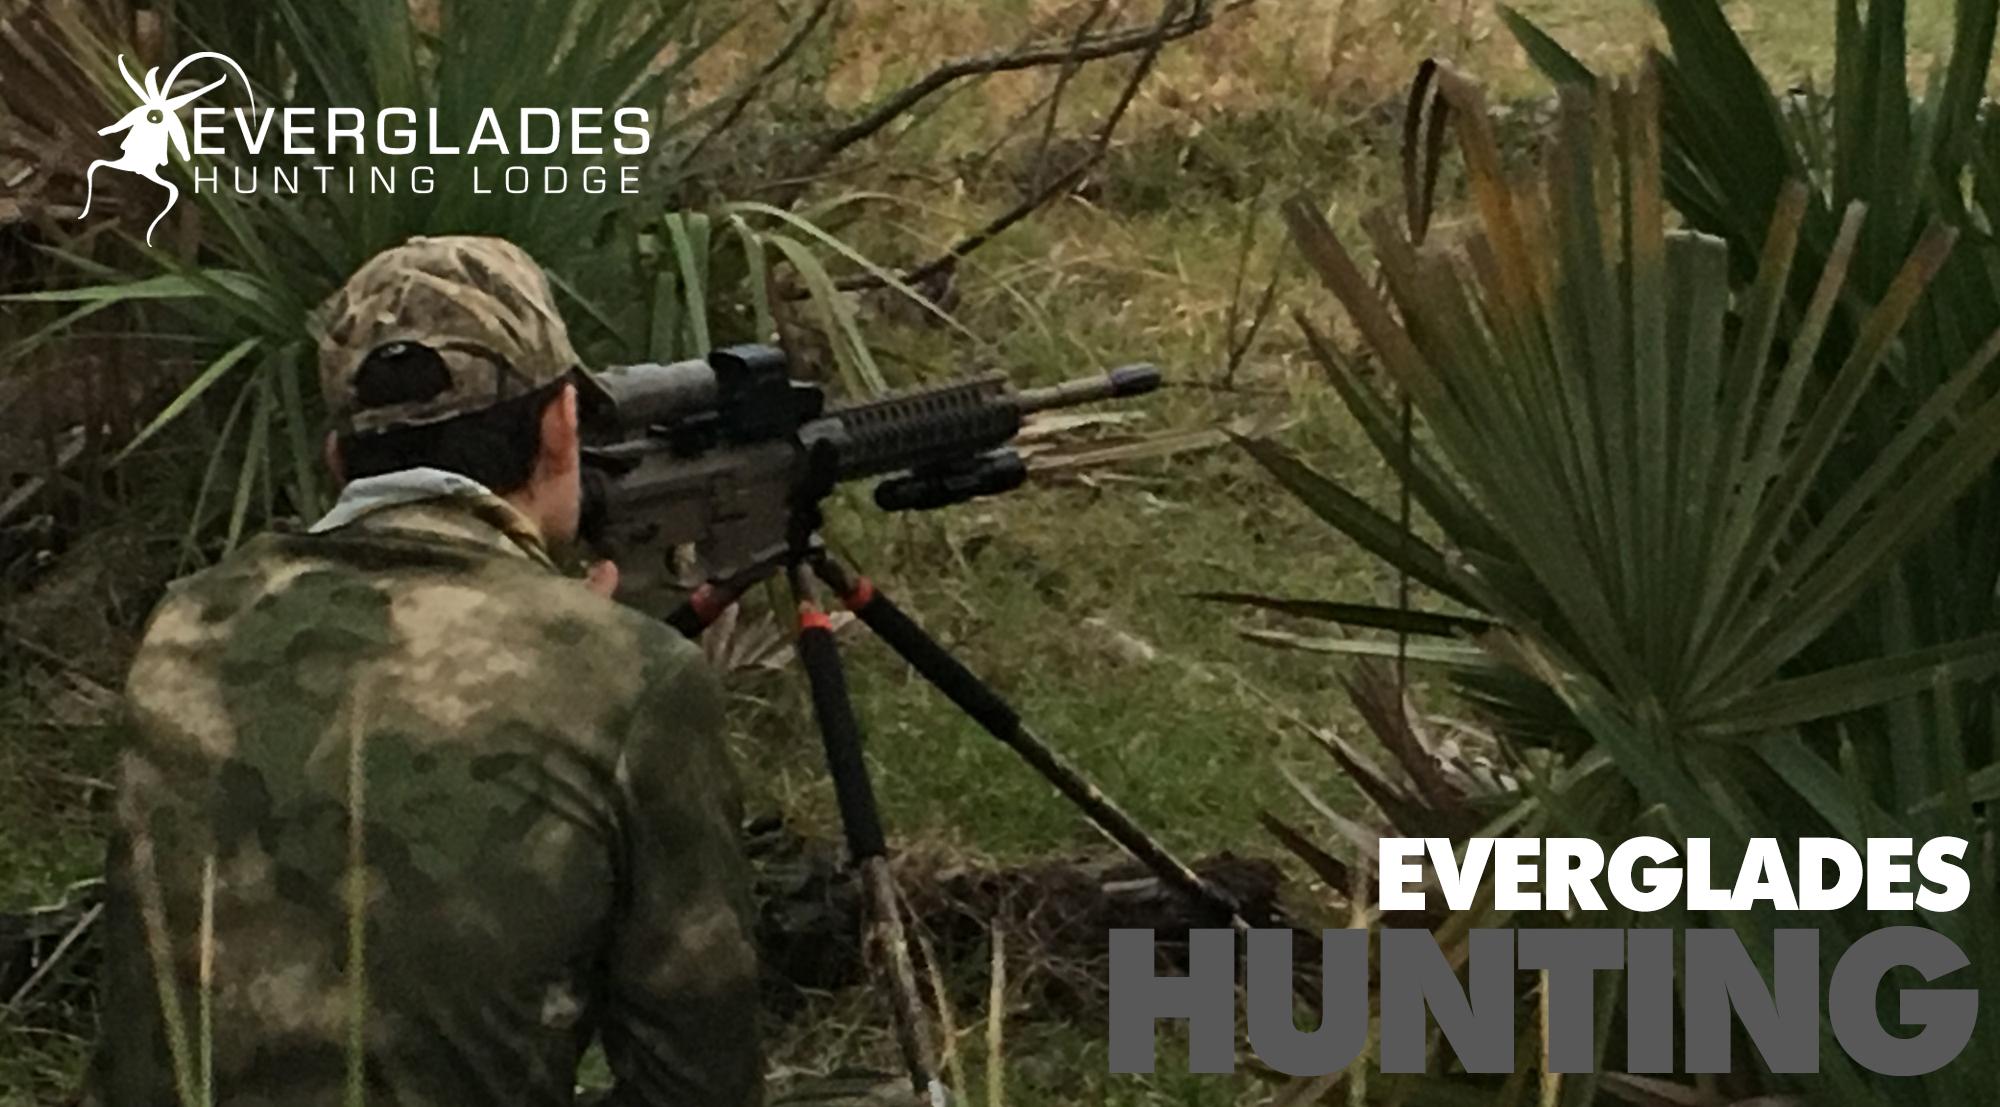 Florida-Hunting-Guides.jpg